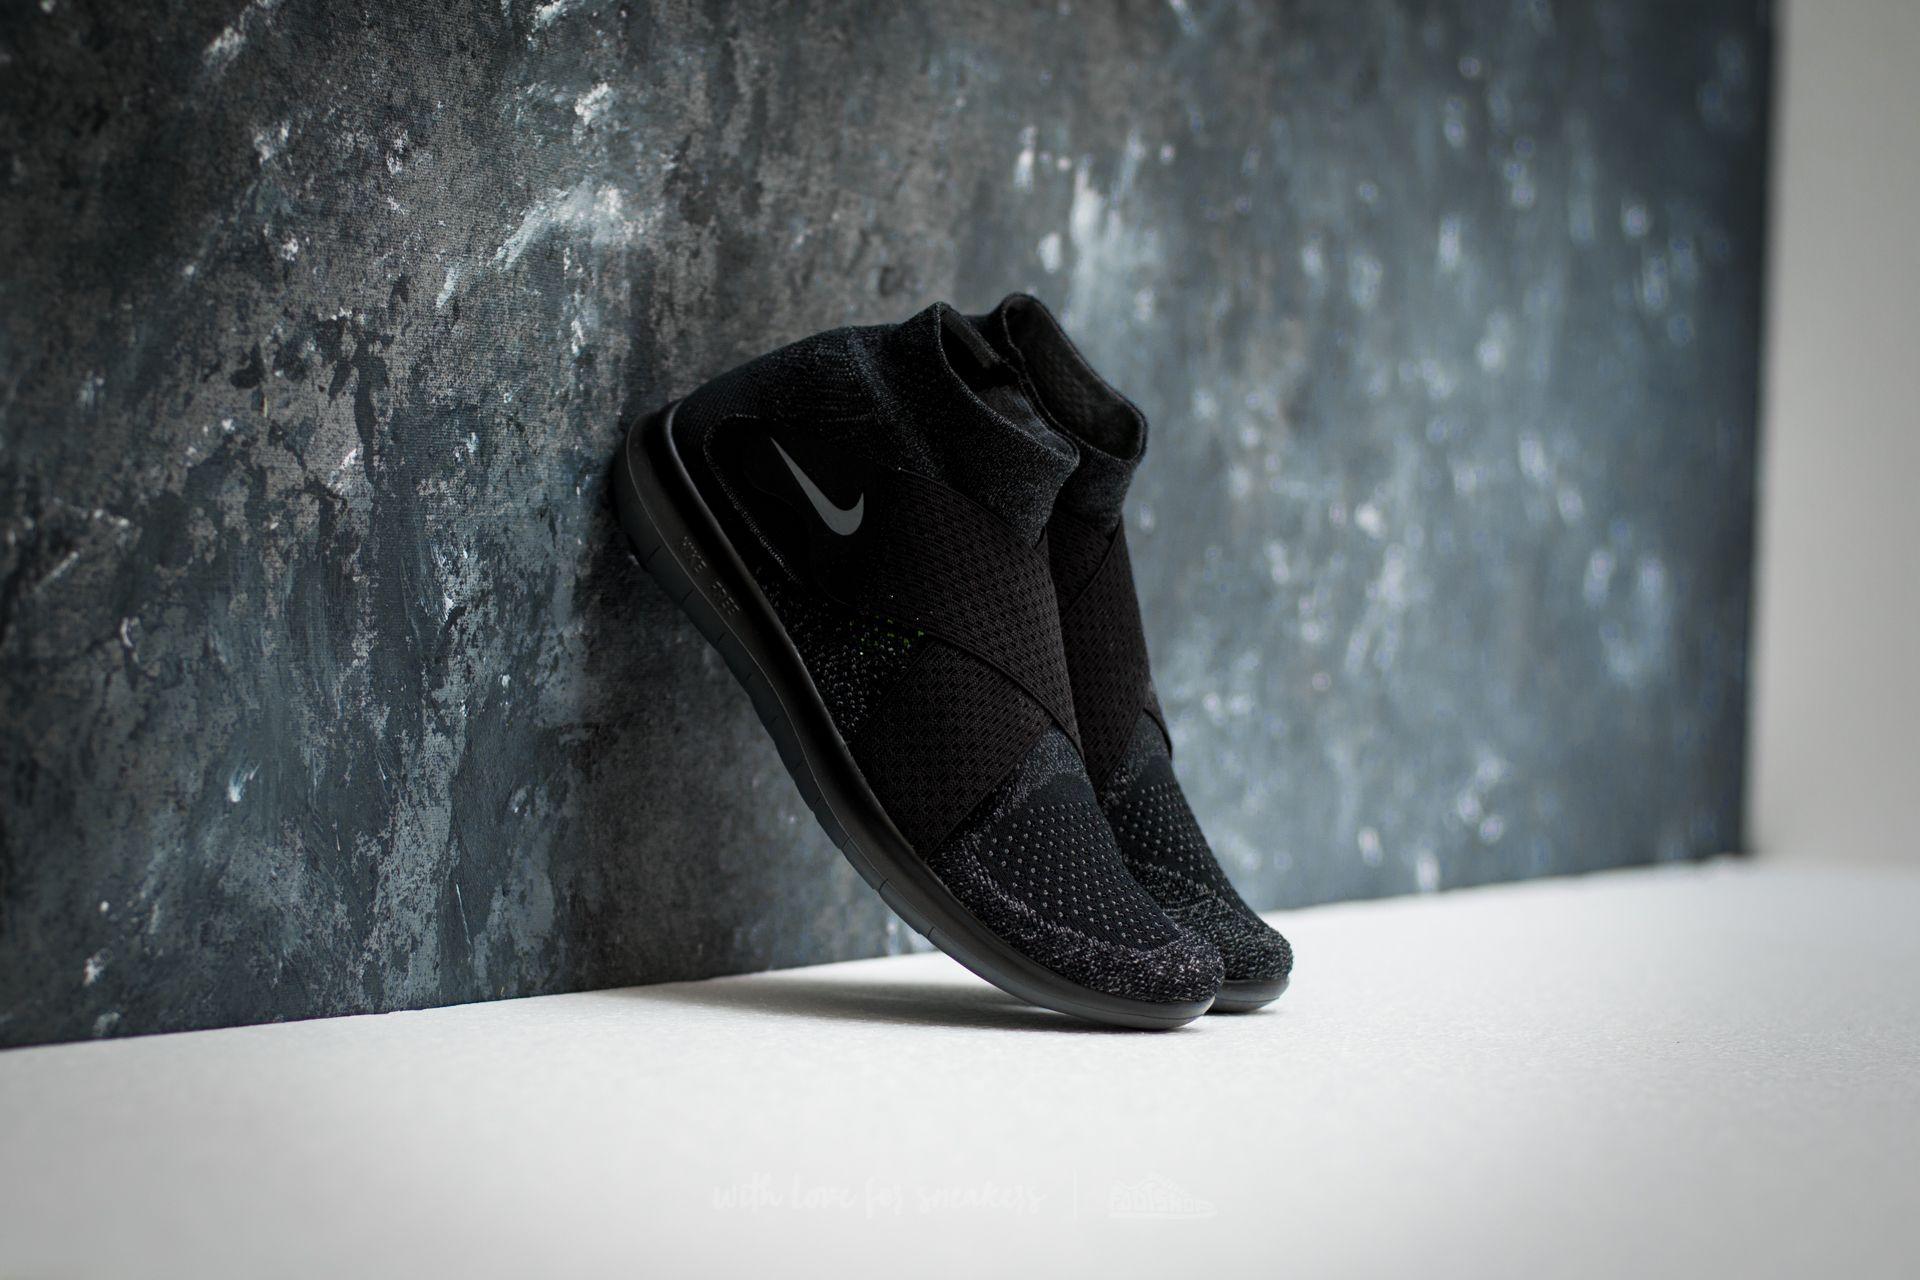 ba6bd97c4cf4 Nike Free Run Motion Flyknit 2017 Black  Dark Grey-Anthracite ...